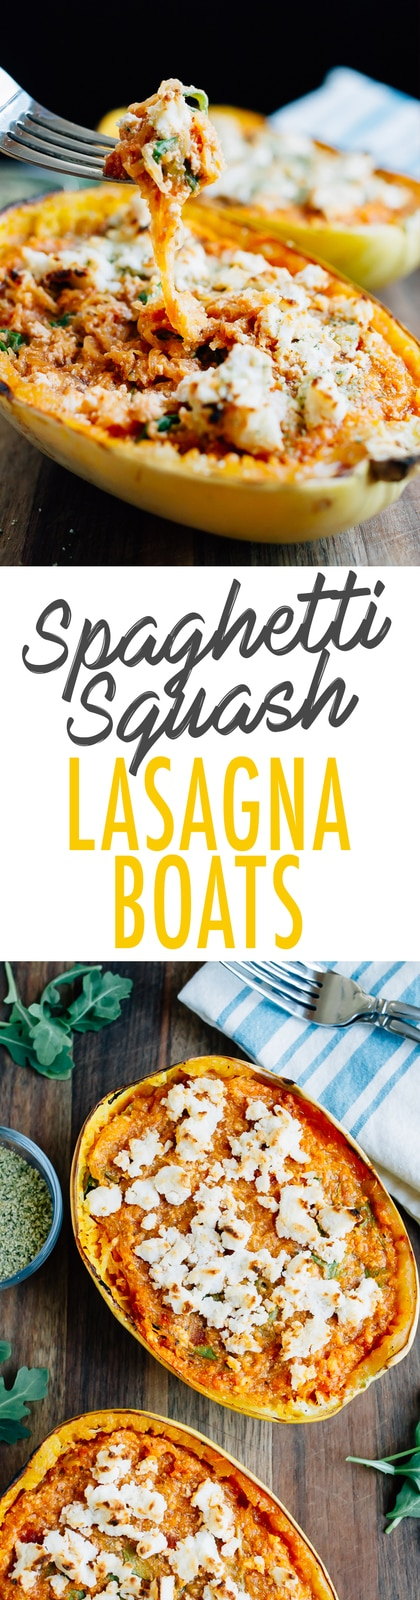 Stuffed Spaghetti Squash Lasagna Bowls #stuffedspaghettisquash Turn spaghetti squash into a meatless meal with this recipe for stuffed SPAGHETTI SQUASH LASAGNA BOWLS. Made with vegan ricotta and hemp parmesan. #spagettisquashrecipes